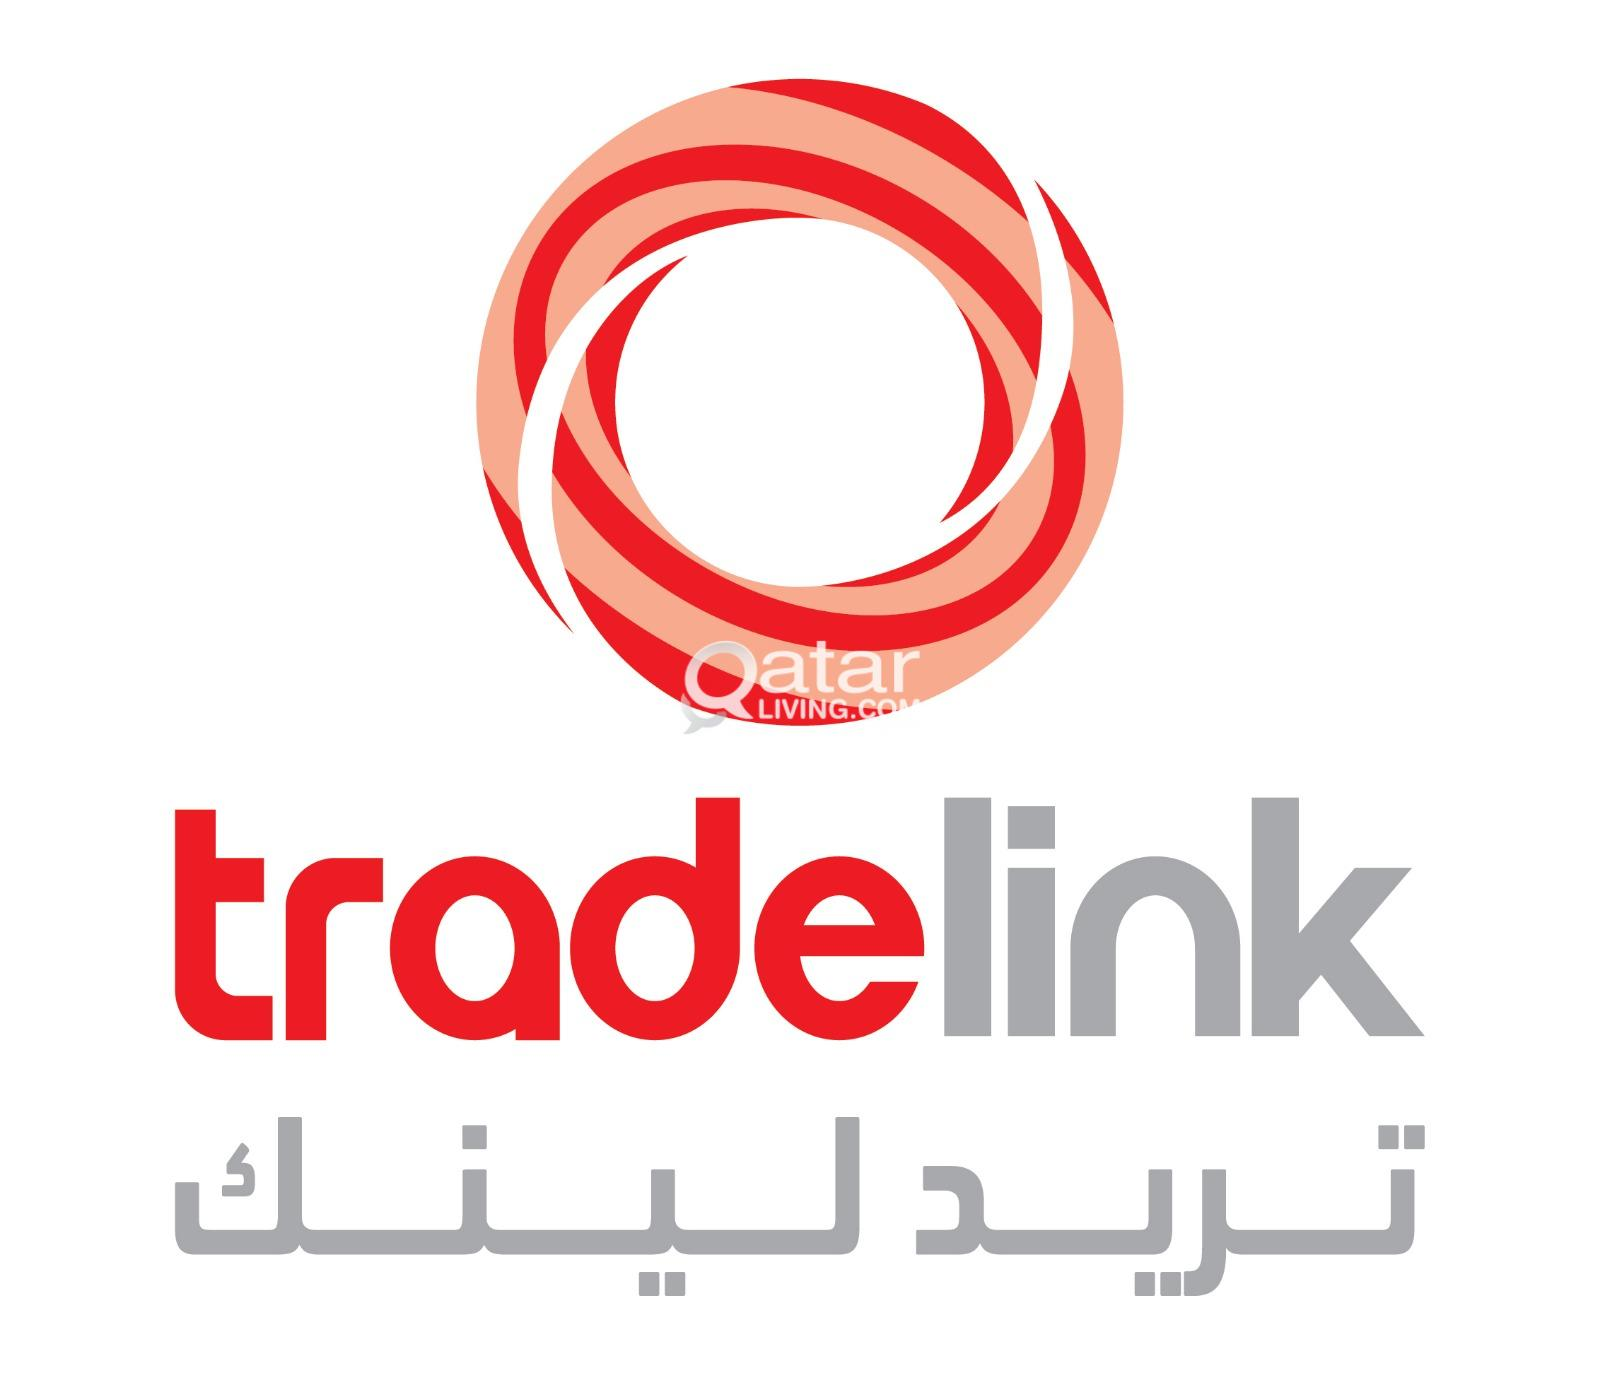 Tradelink Supplier Of All Kind Of Building Materials Qatar Living